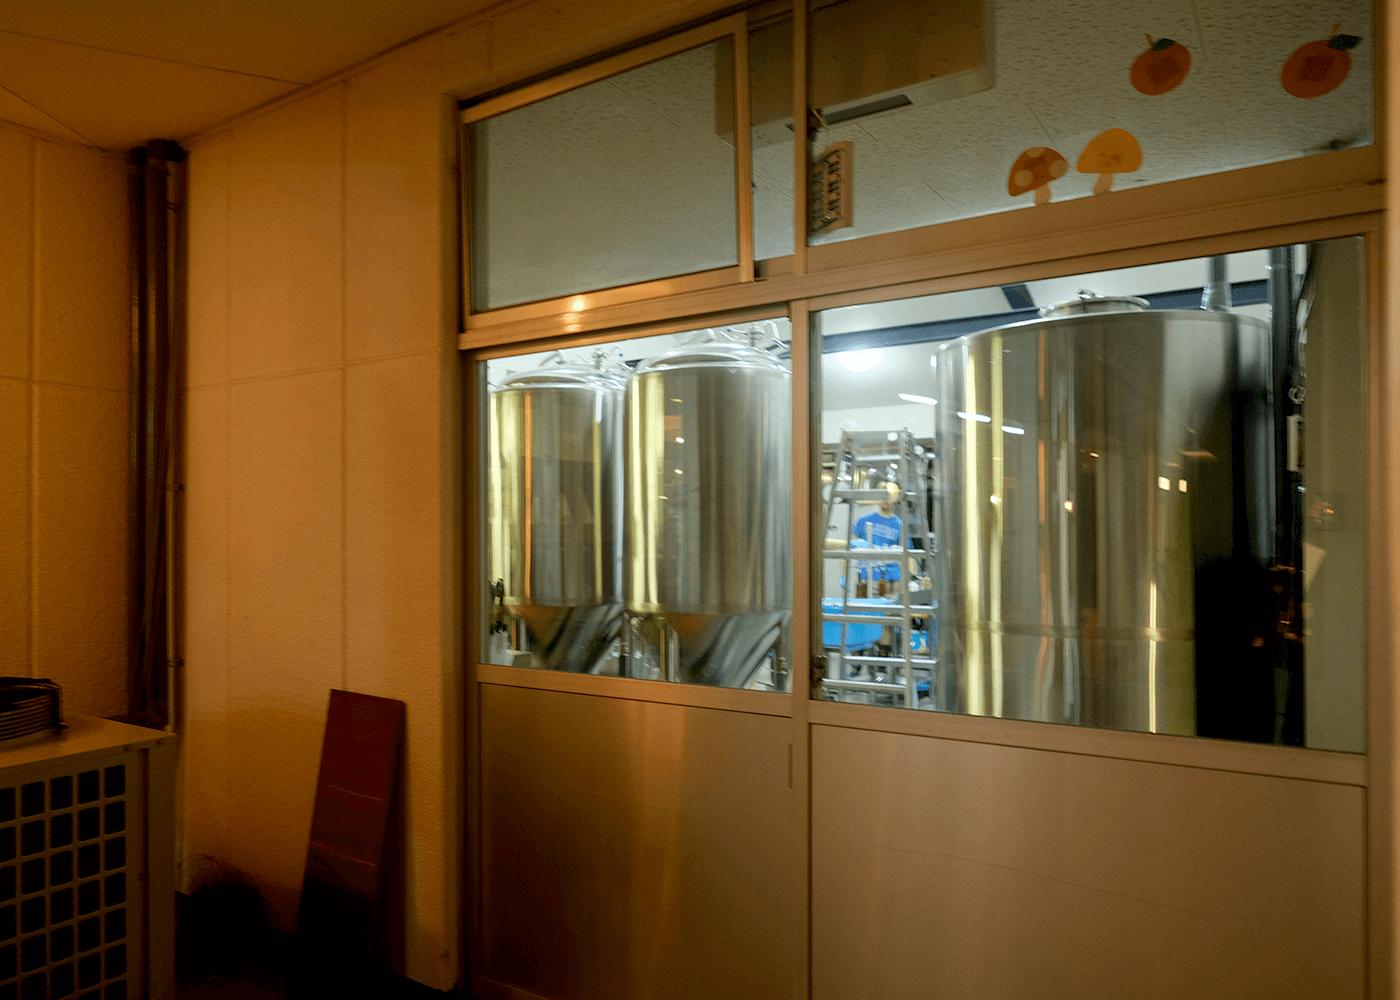 NOMCRAFT(ノムクラフト)Brewing とGOLDEN RIVER(ゴールデンリバー)